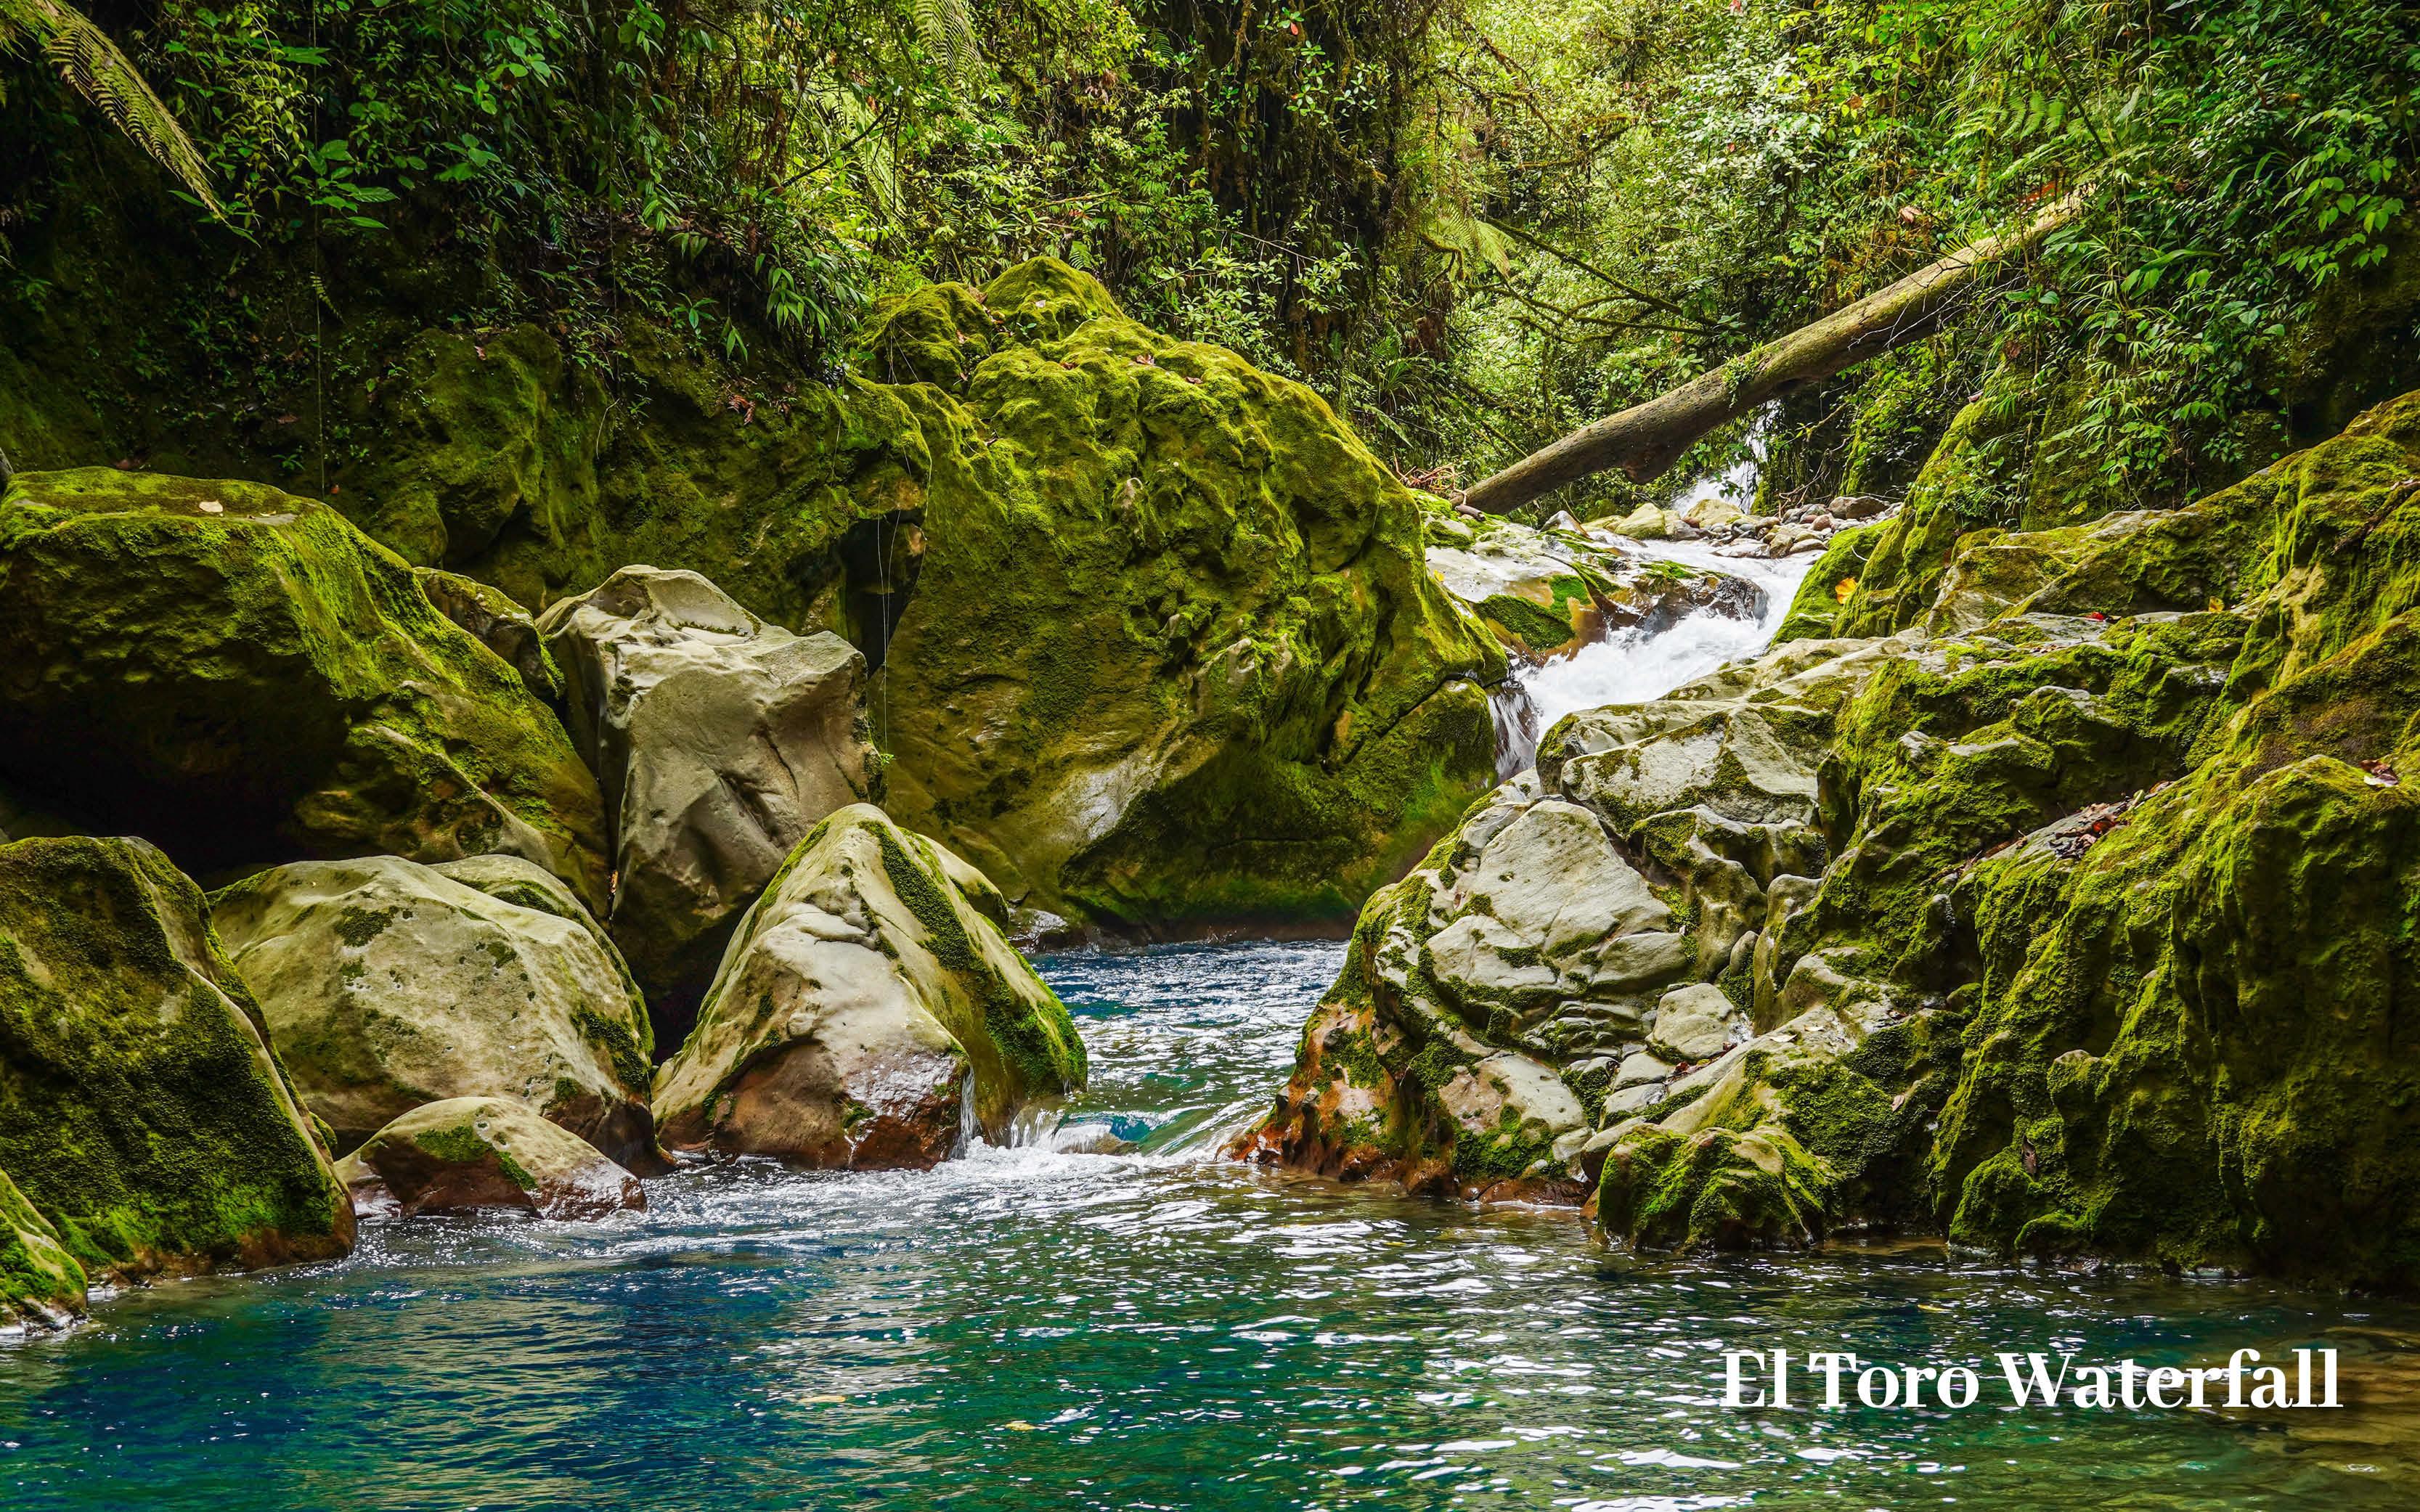 COSTA RICA HOLIDAY OFFER EL TORO WATERFALL